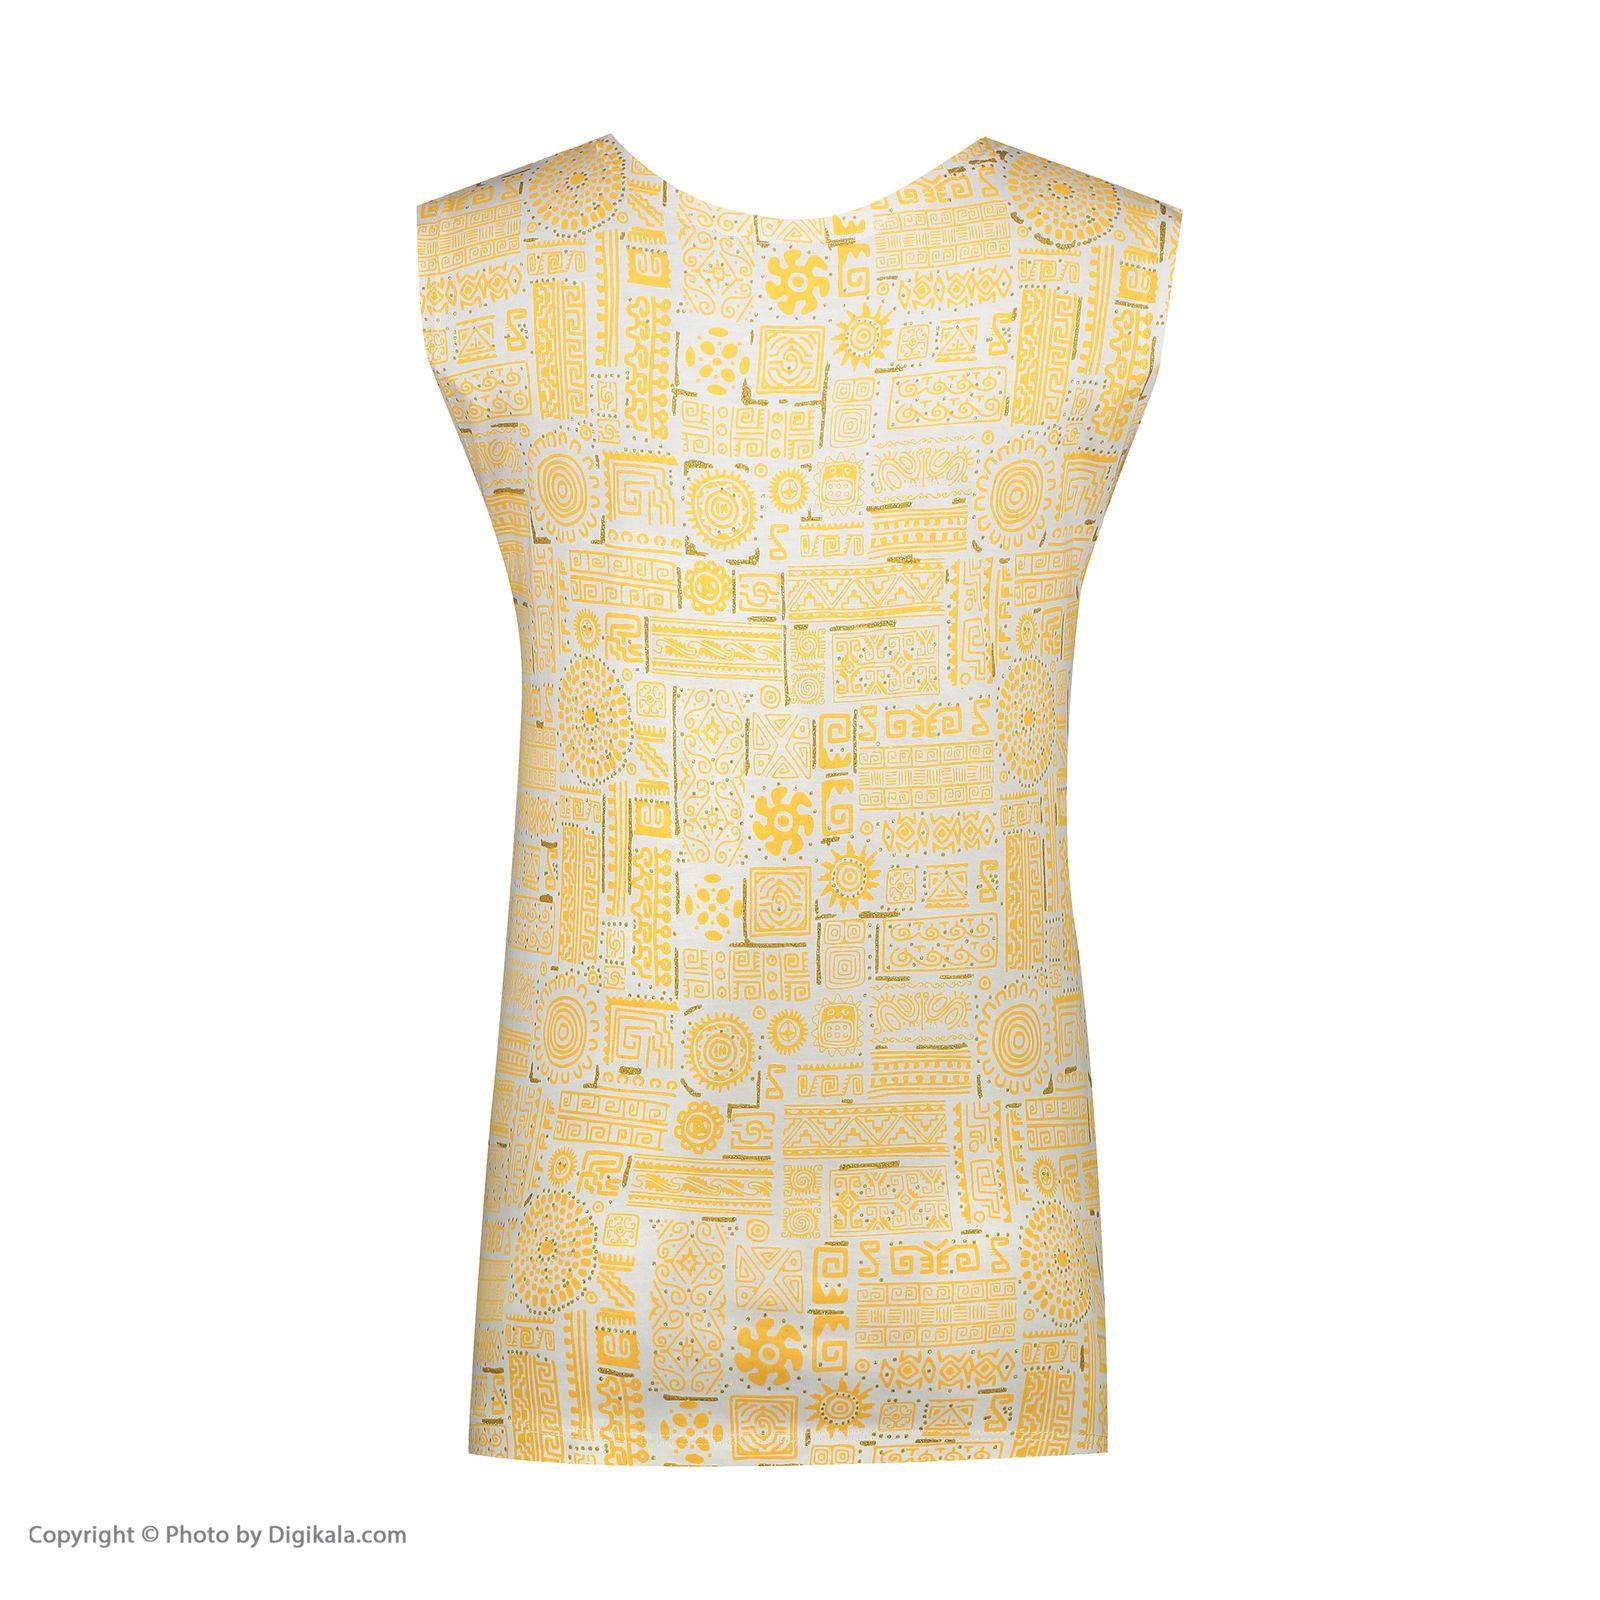 ست تاپ و شلوارک زنانه کد 0217 رنگ زرد -  - 9